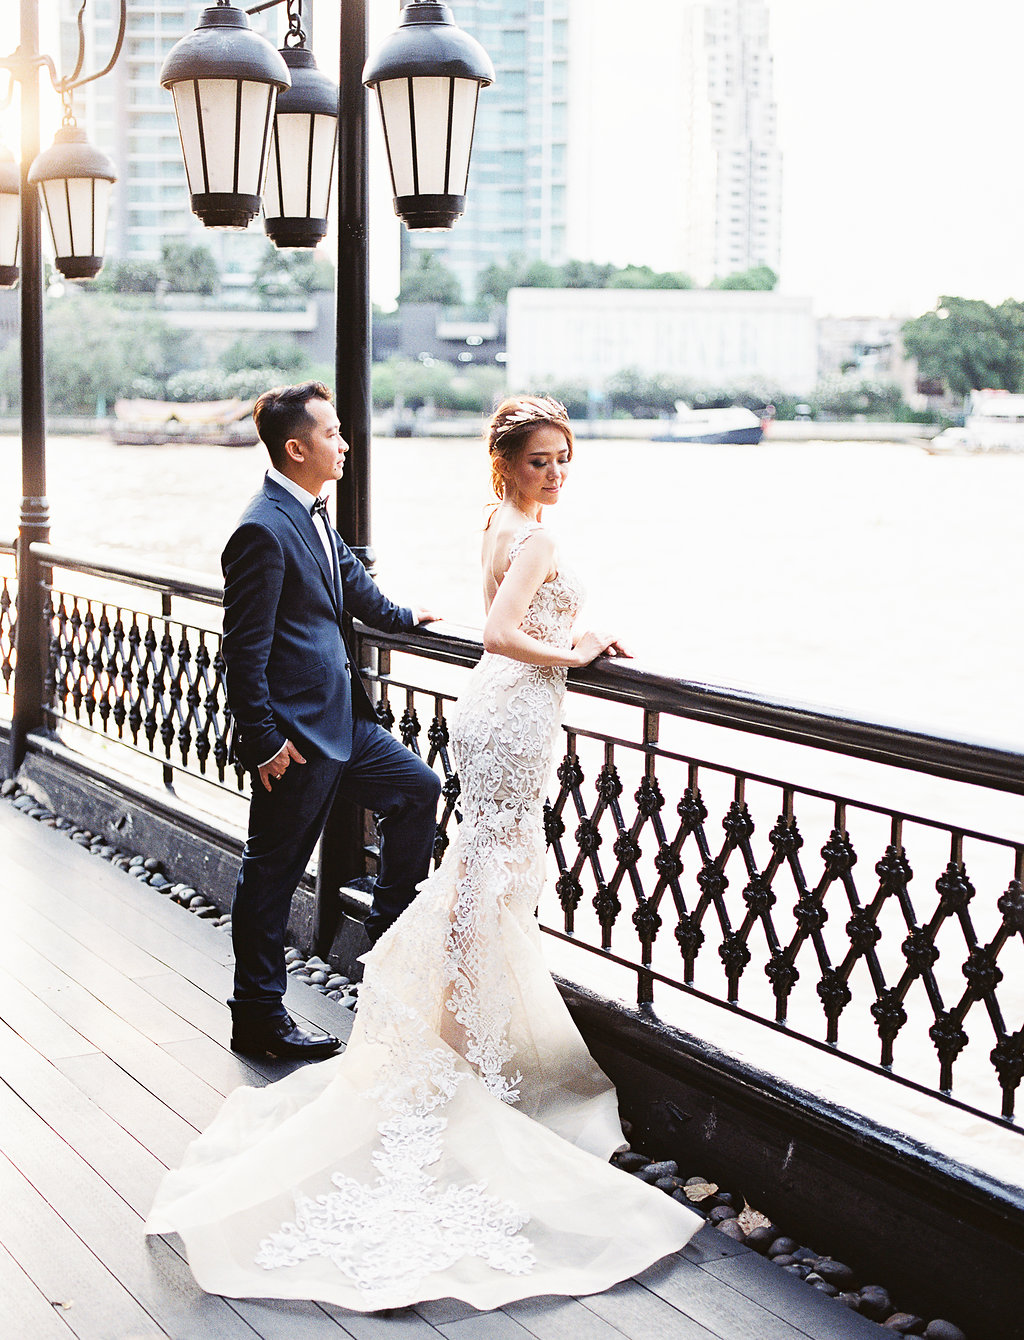 Luxe destination wedding in Jakarta and Bankok   fine art film wedding photographer Tanja Kibogo 5001.JPG